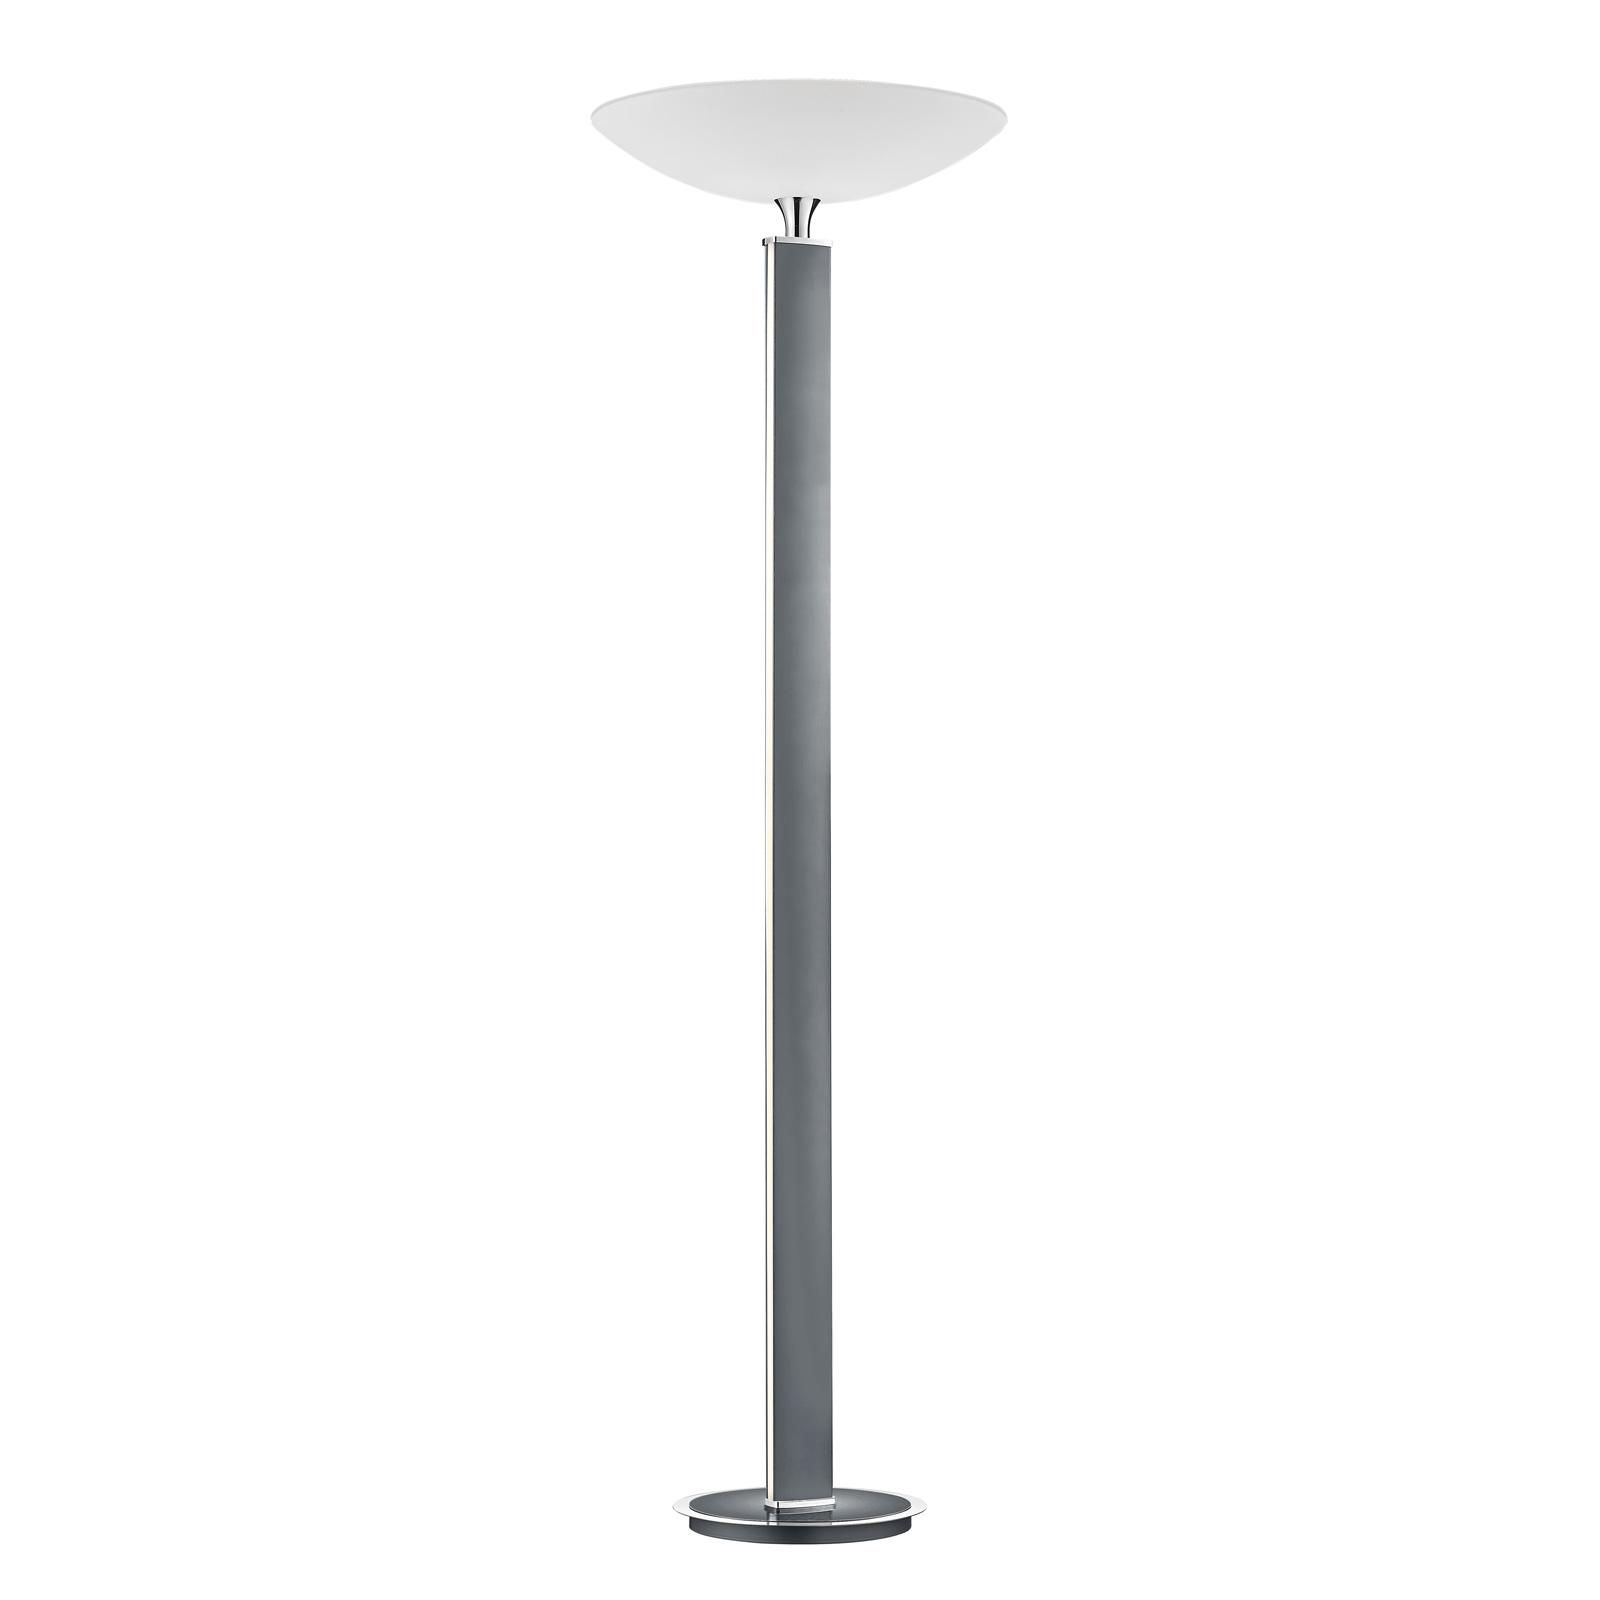 BANKAMP Pure F LED uplighter, antraciet